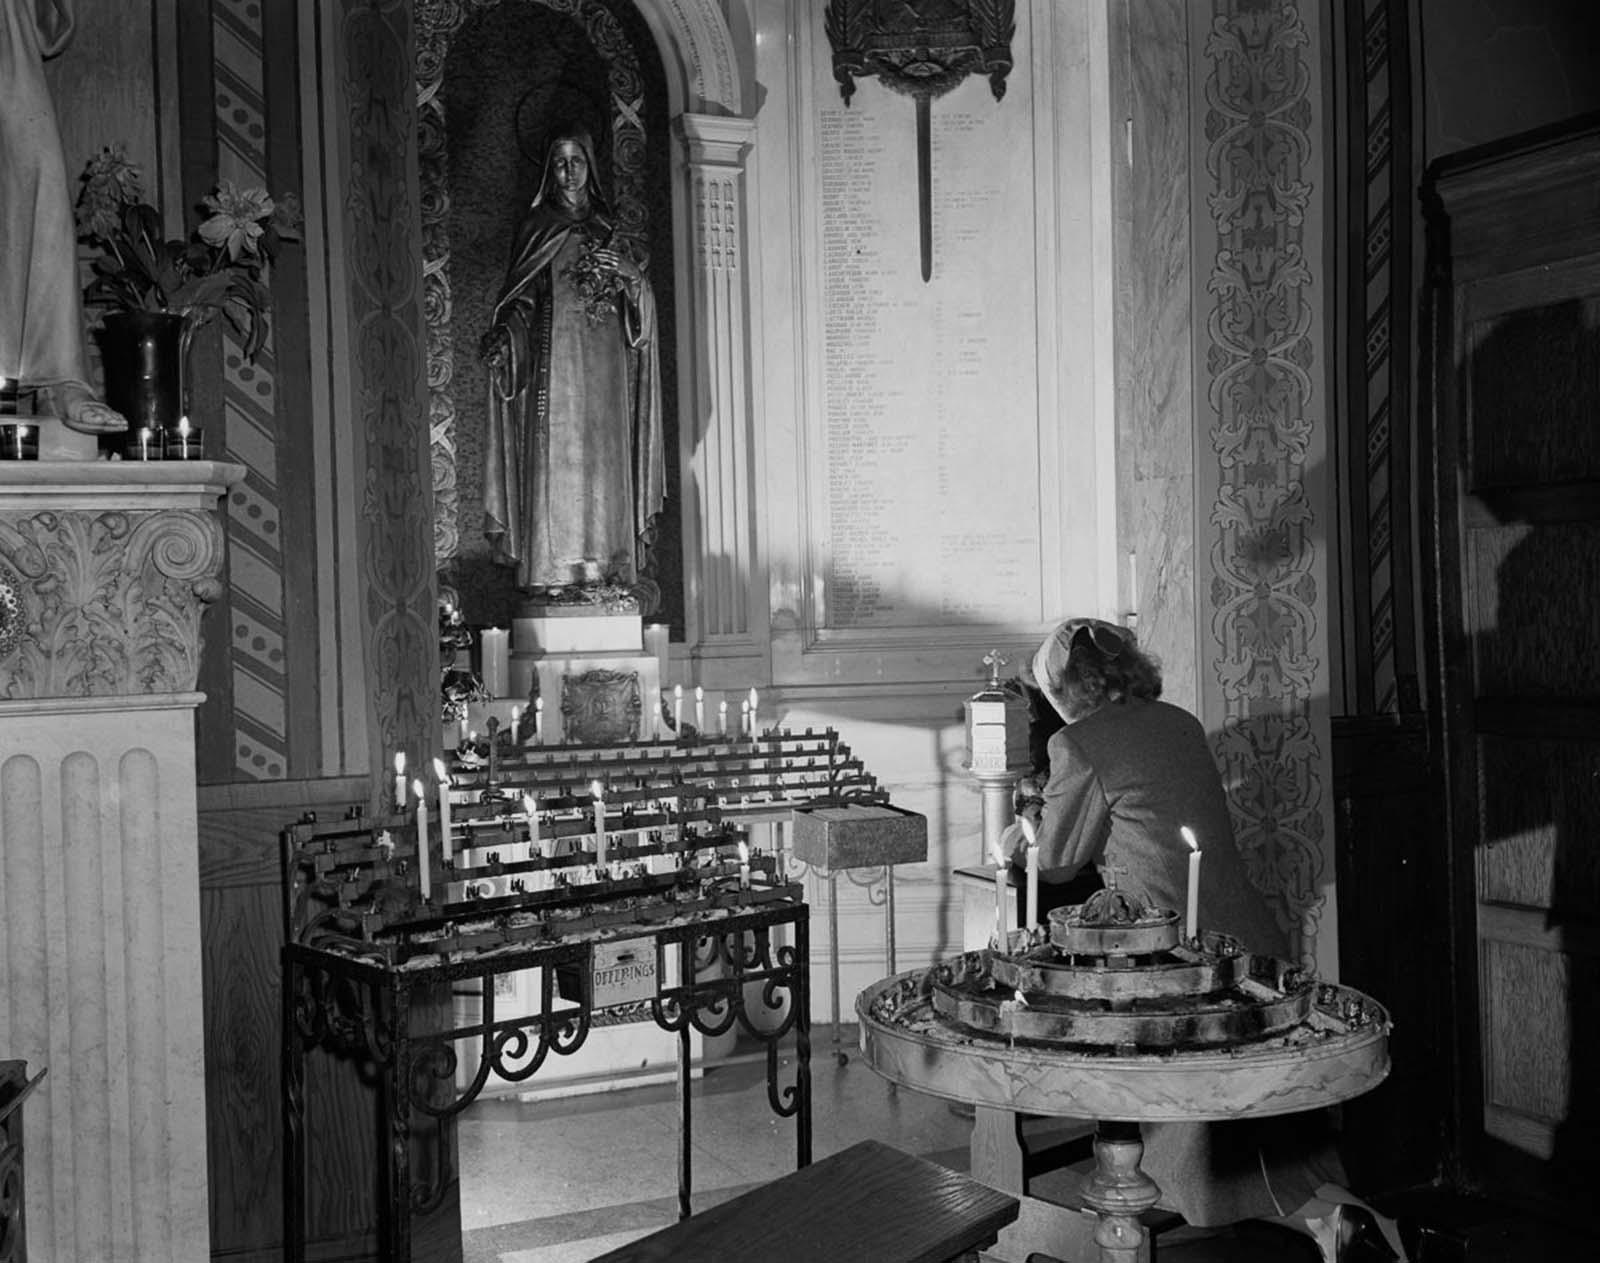 A woman prays at St. Vincent de Paul's church on 23rd Street.